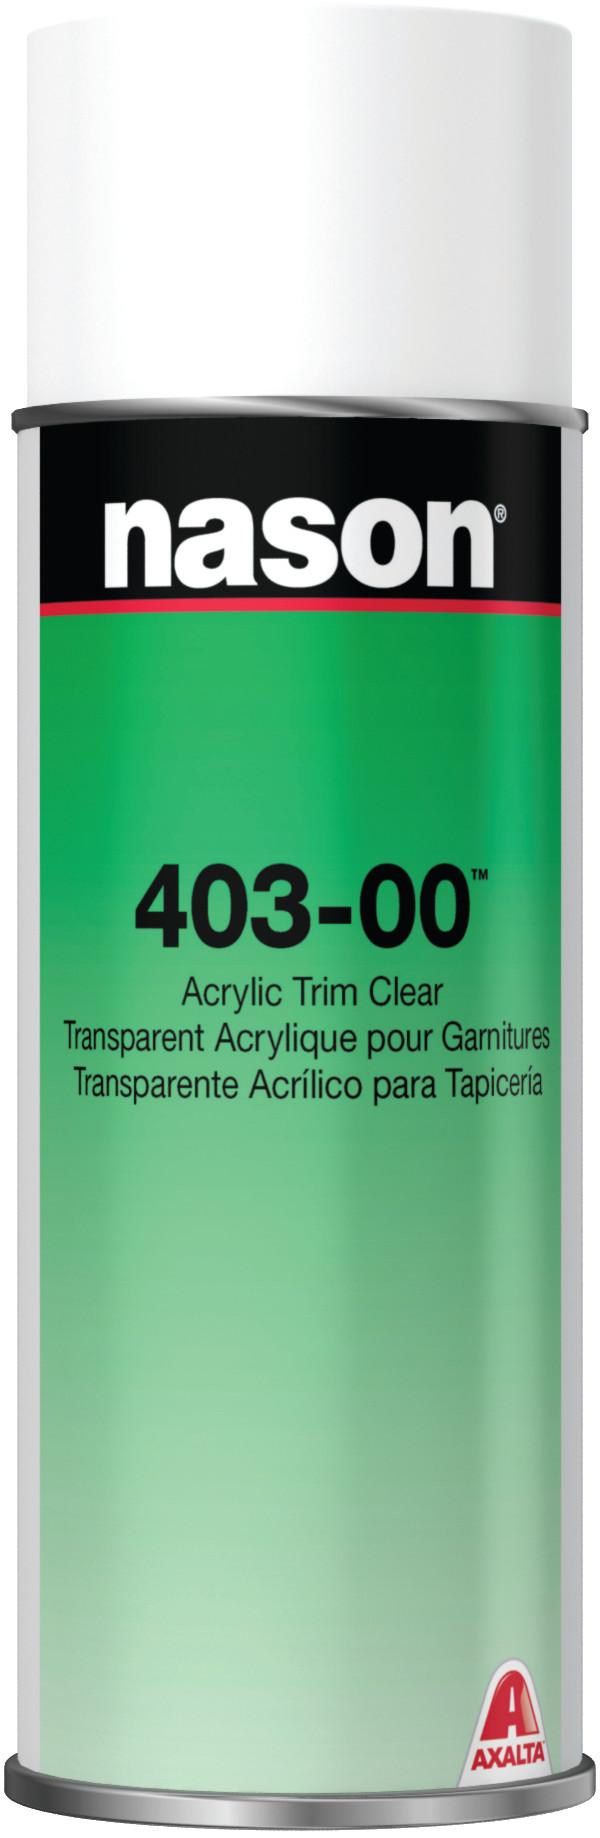 Hose Spray Nozzle >> Axalta Nason 403-00 Acrylic Trim Clear